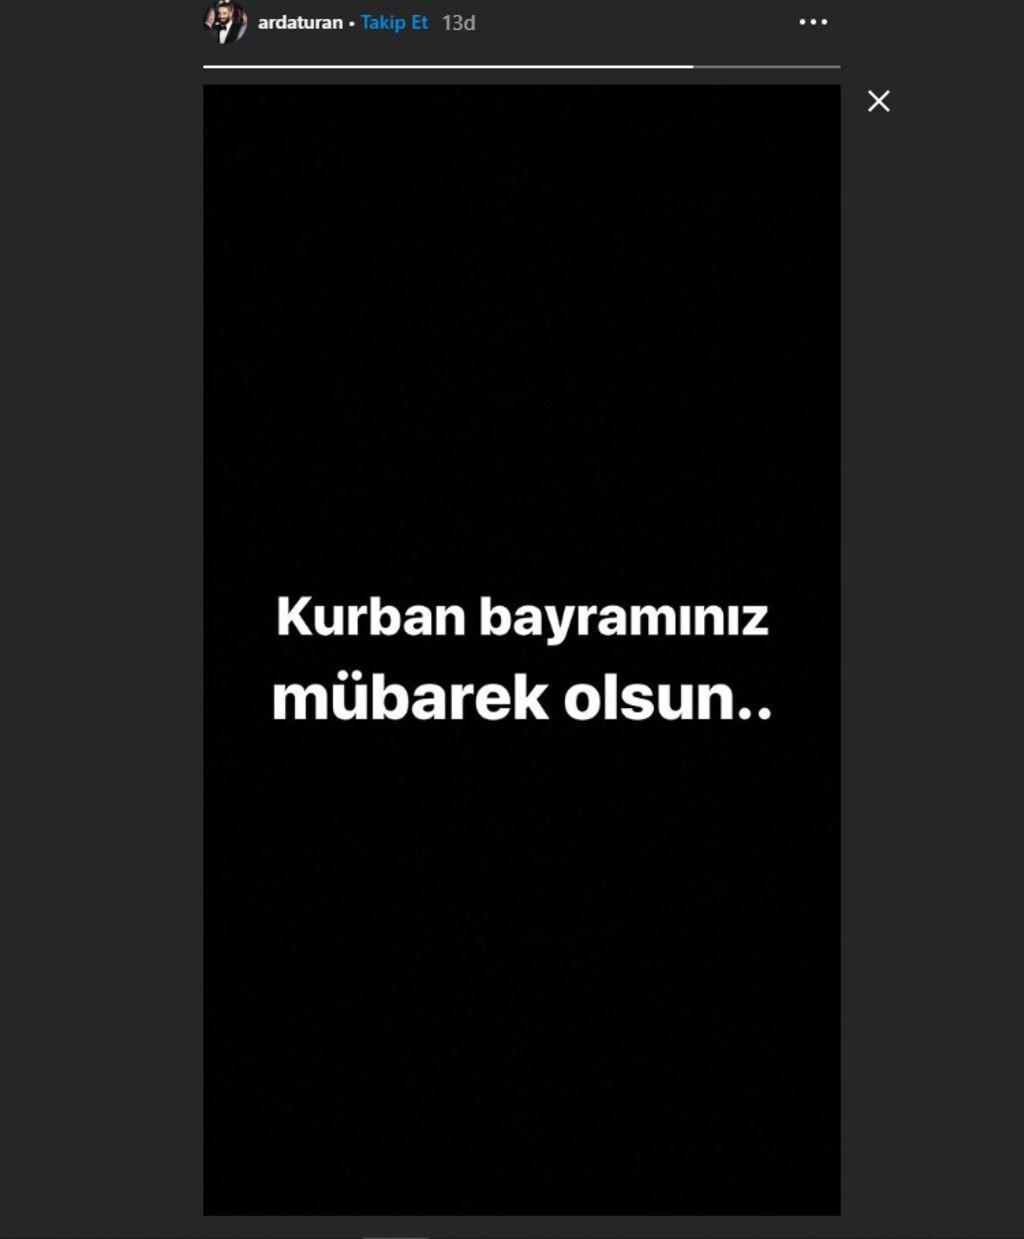 Arda Turan Instagram bayram.jpg